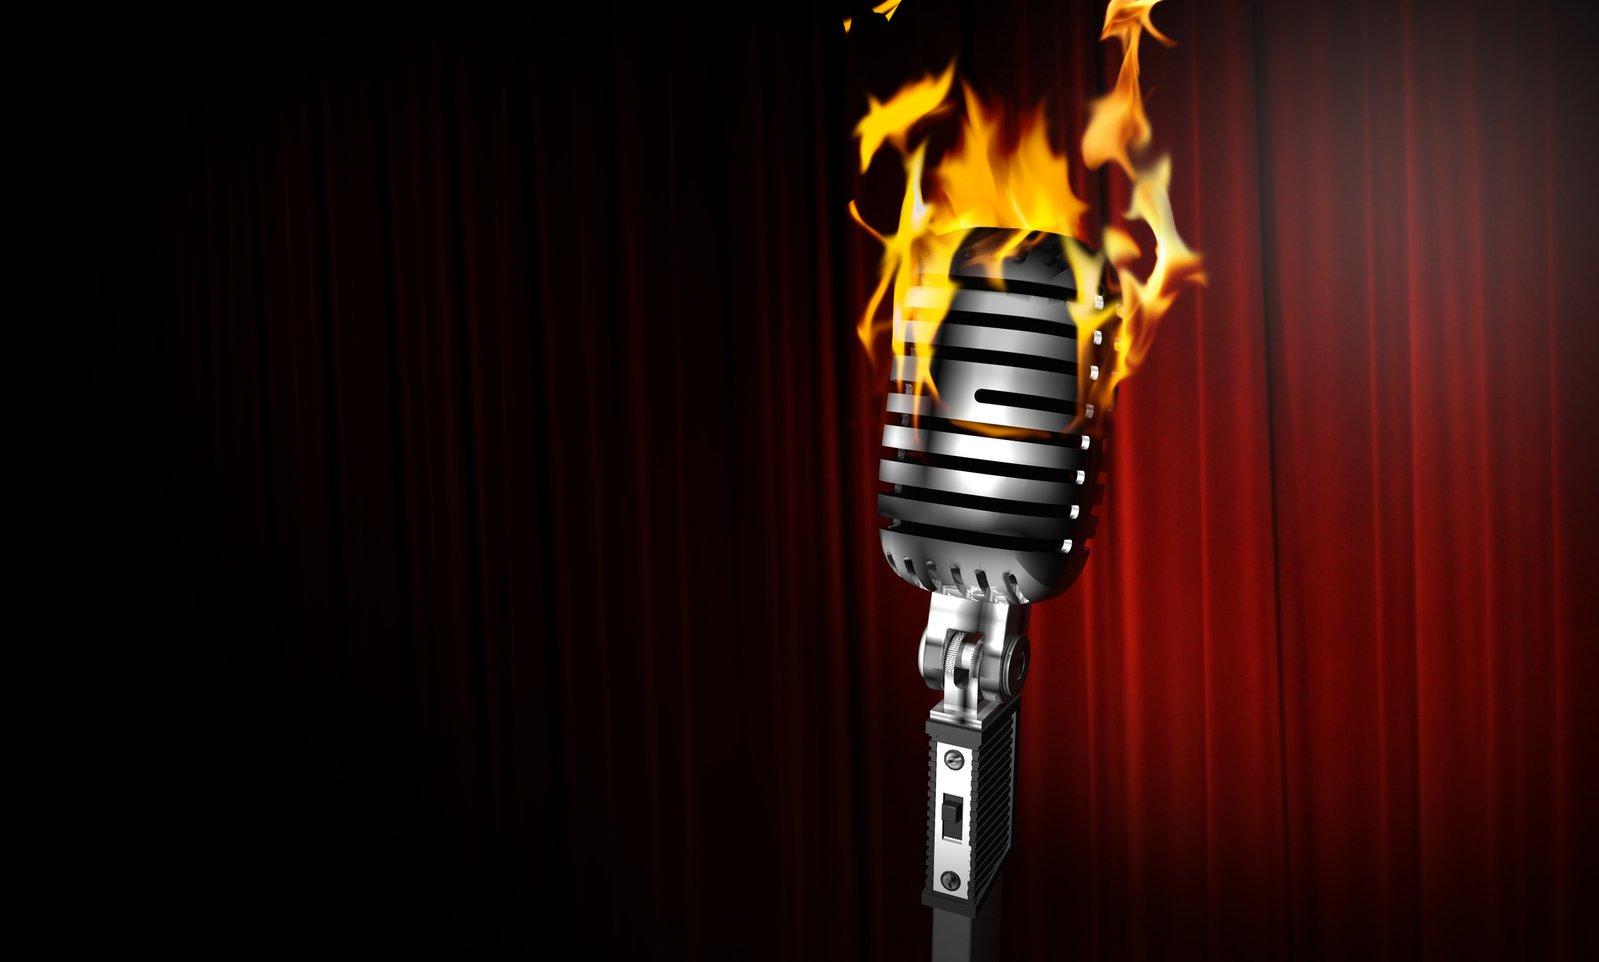 рок микрофон картинки представления можно